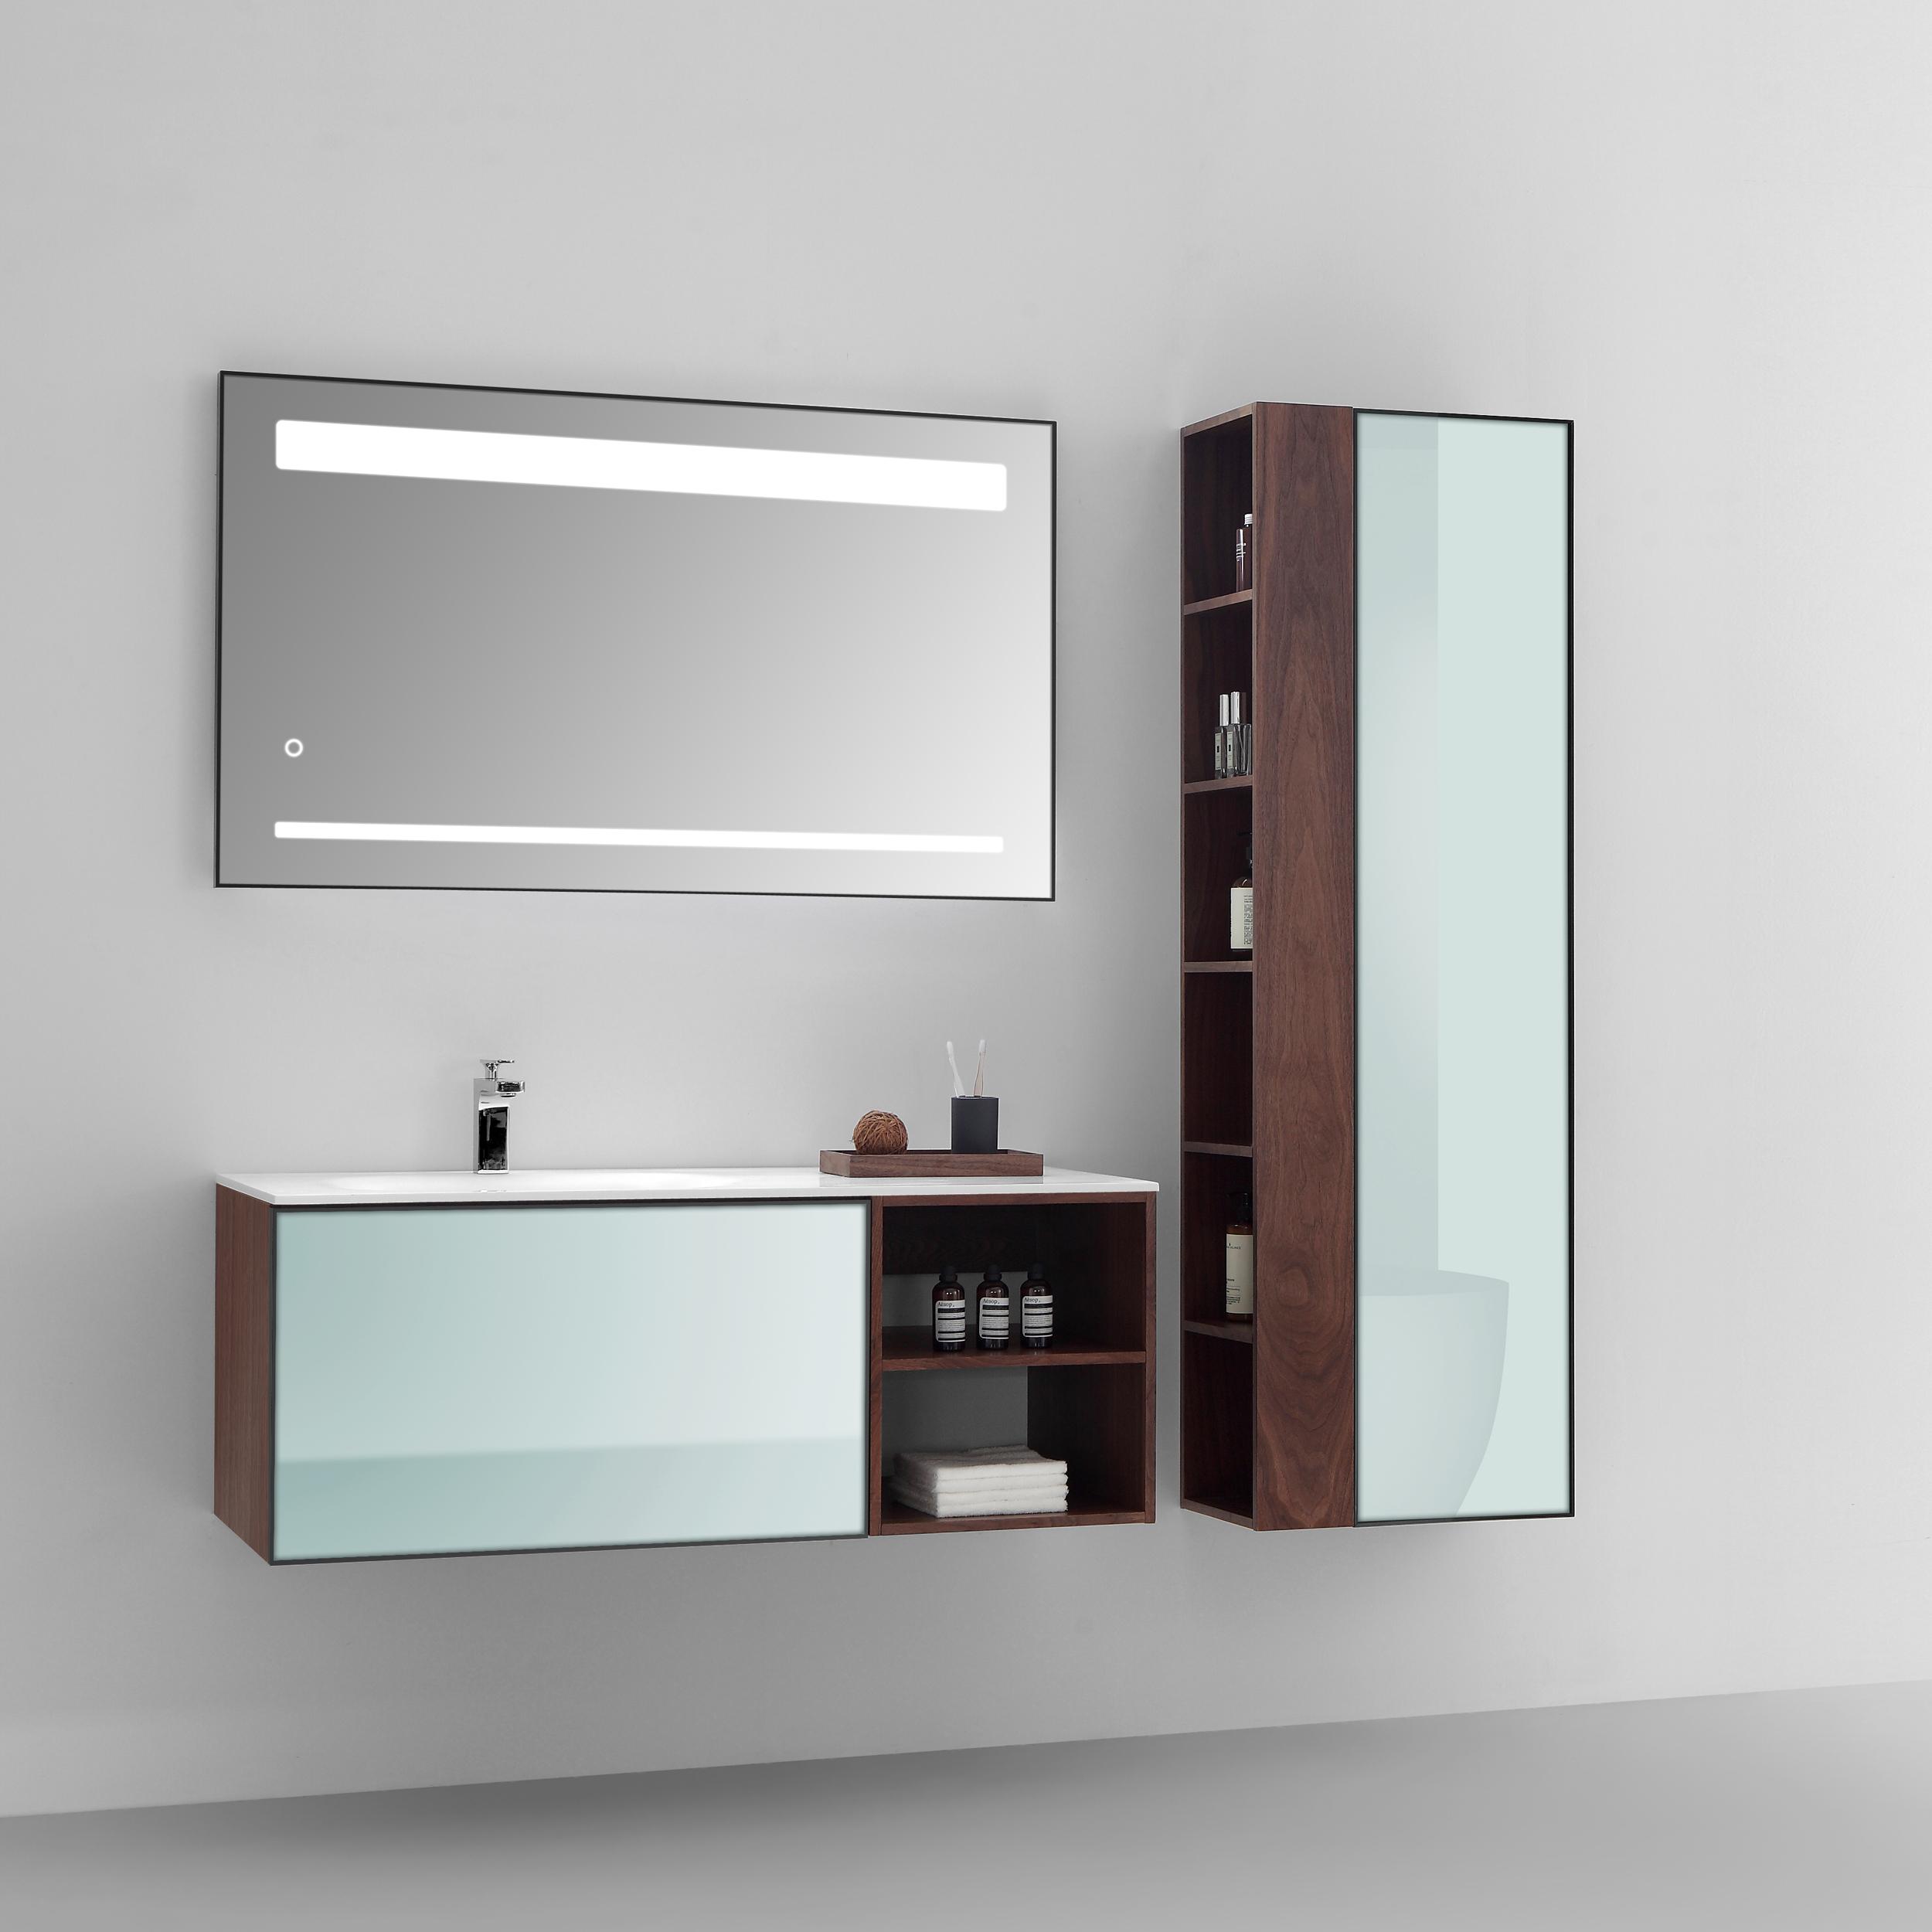 Eviva Napa 48 inch White and Walnut Wall Mount Bathroom Vanity